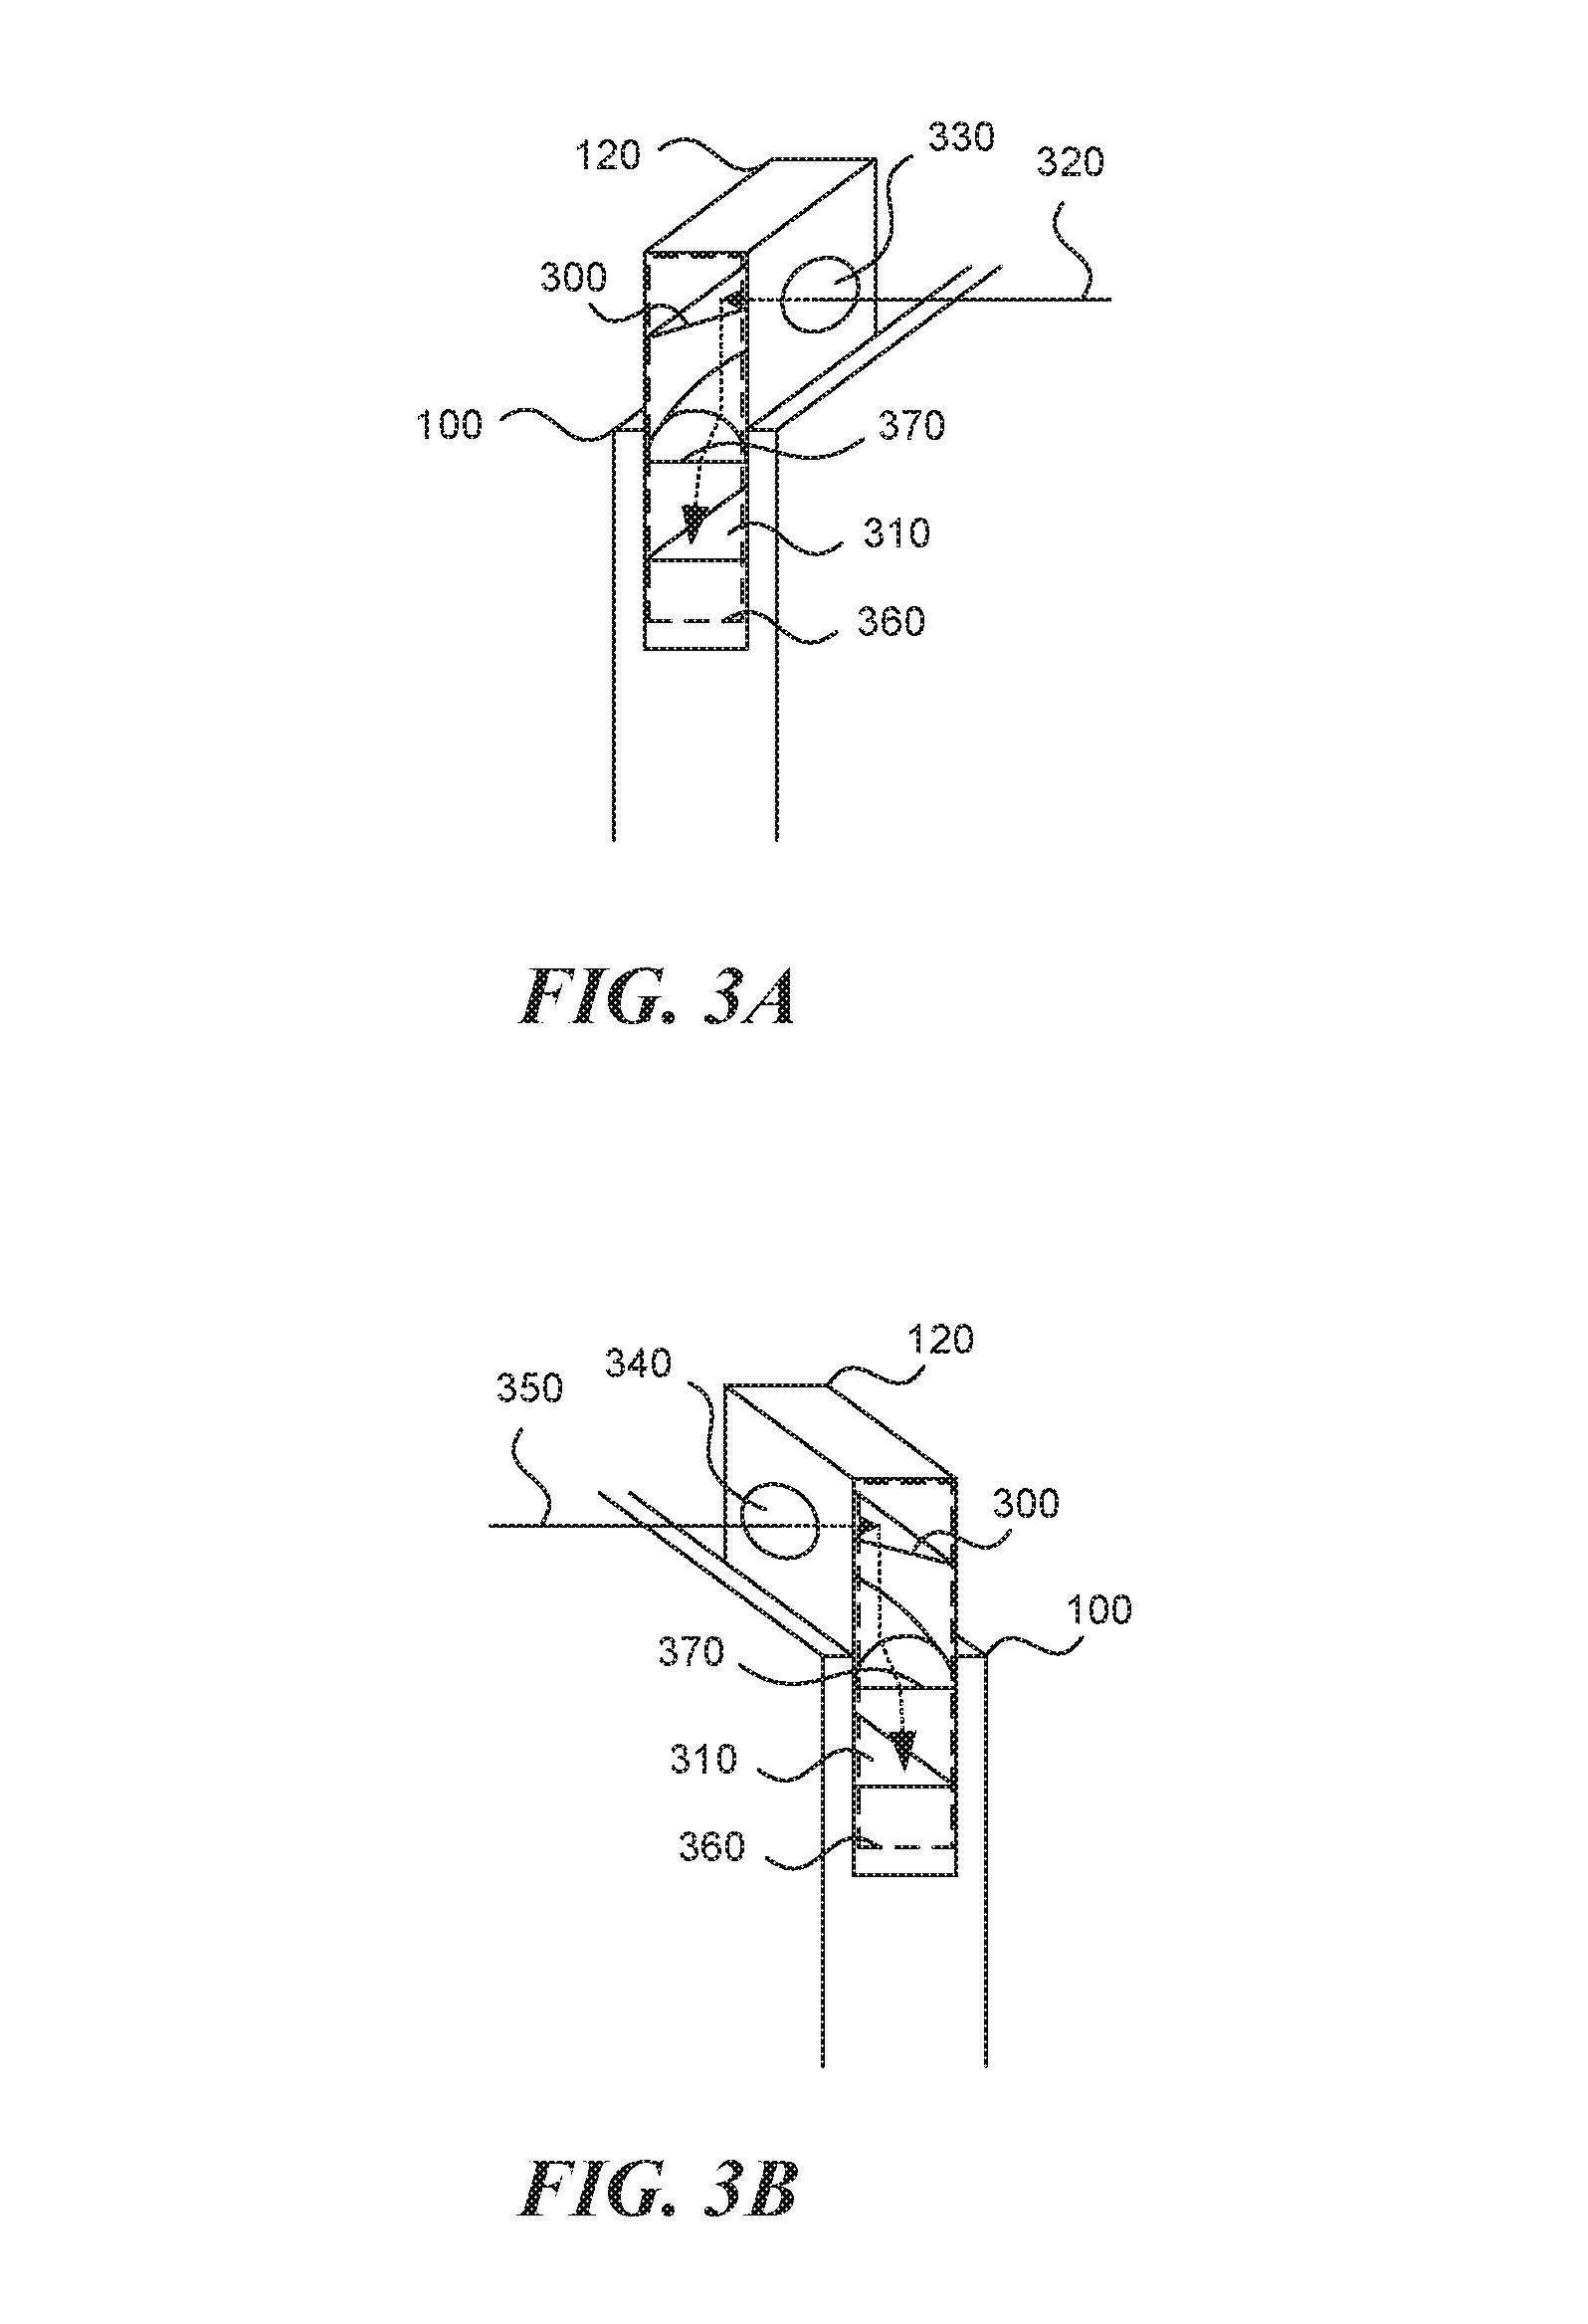 Essential Pop up Camera Patent 16